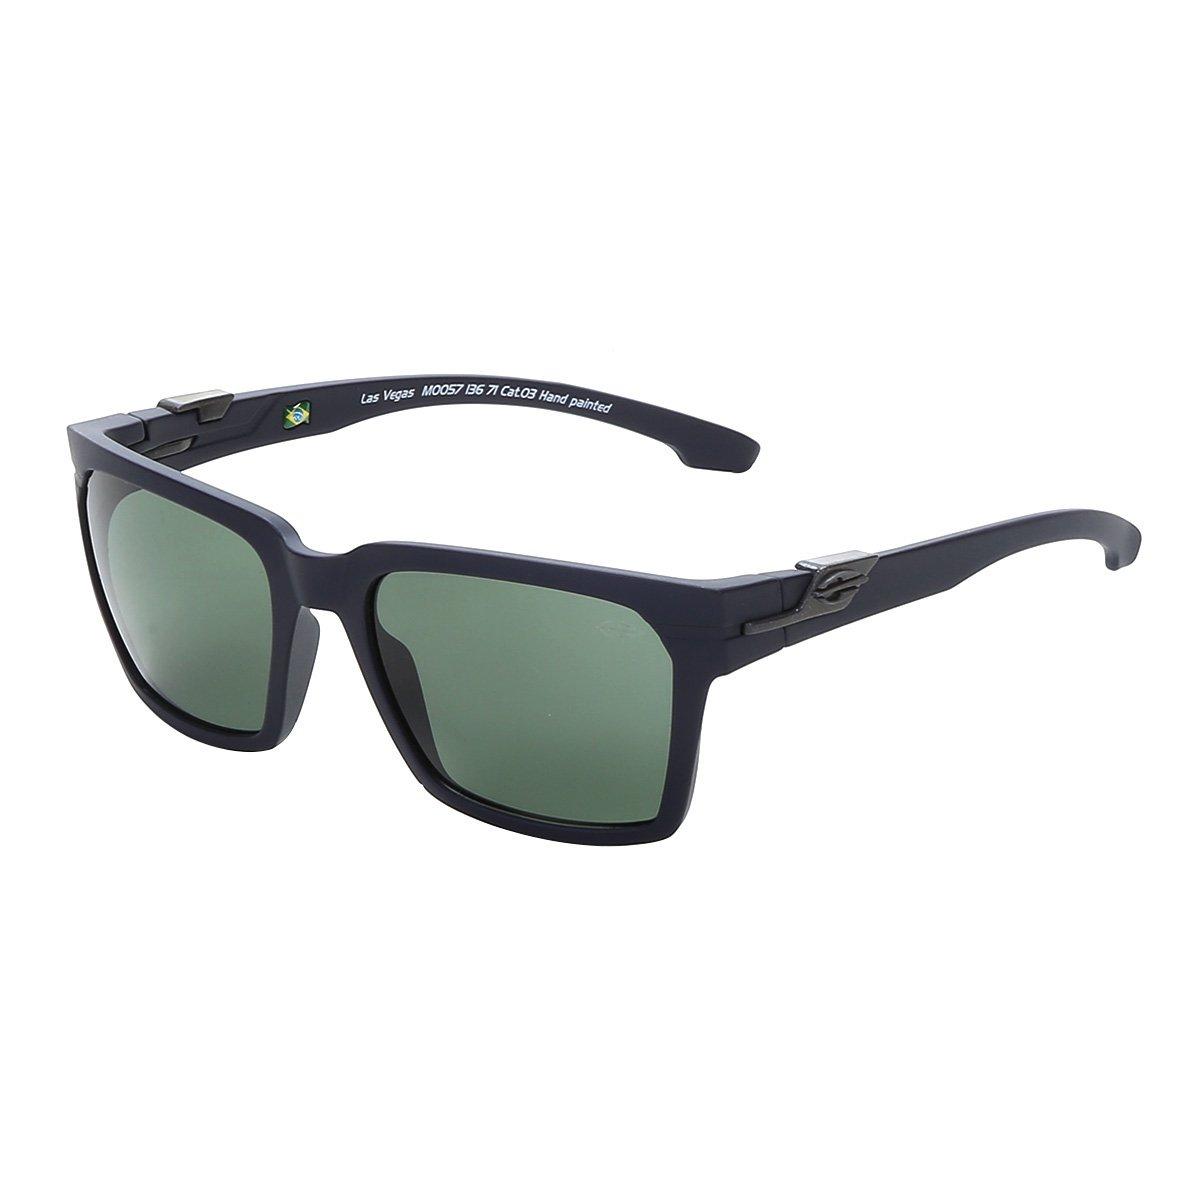 Óculos de Sol Mormaii Las Vegas Masculino - Compre Agora   Netshoes f1198944e0